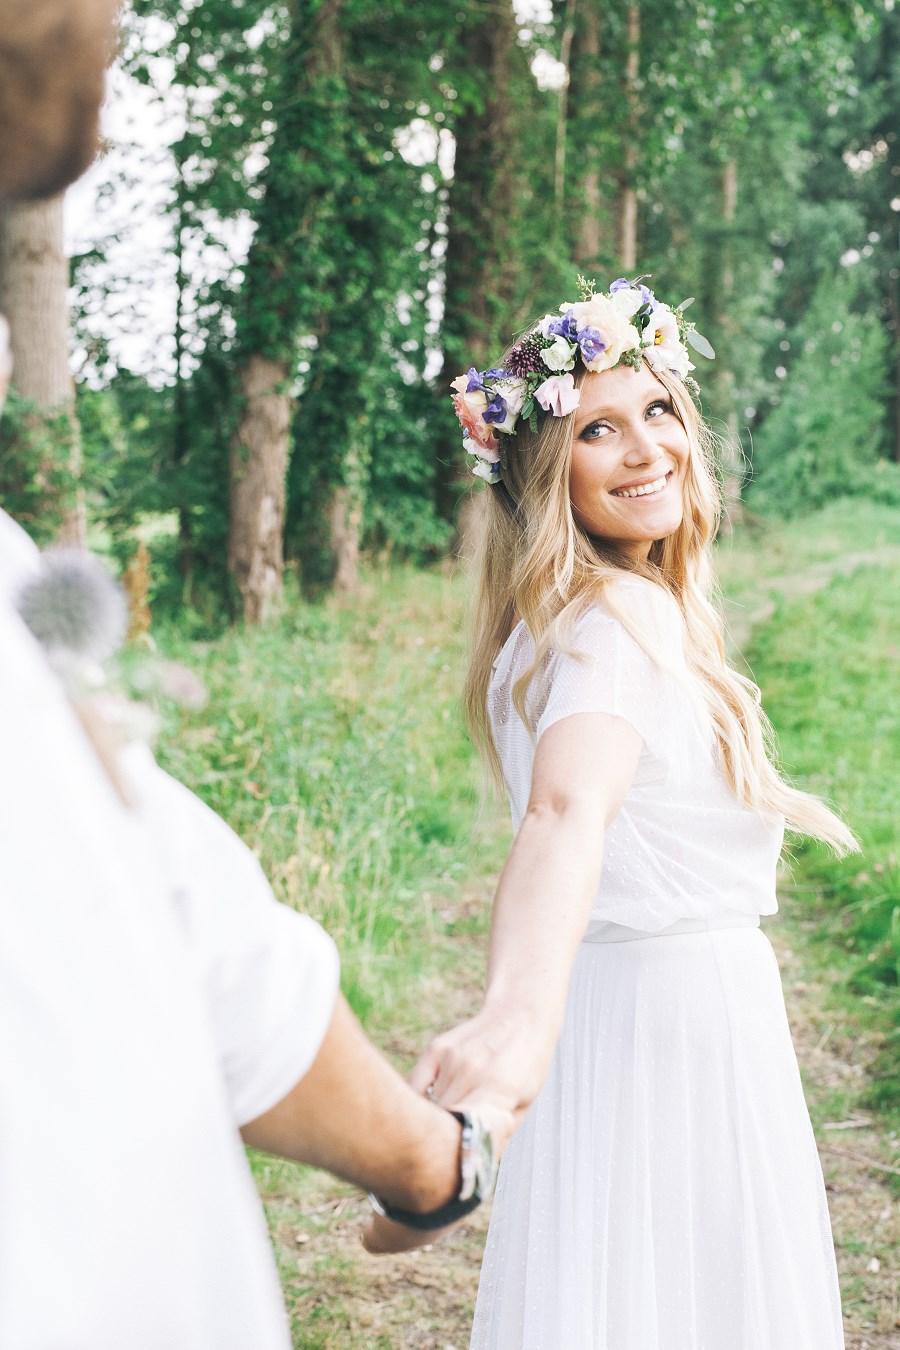 Lovetralala_shooting d'inspiration kiss the bride_22